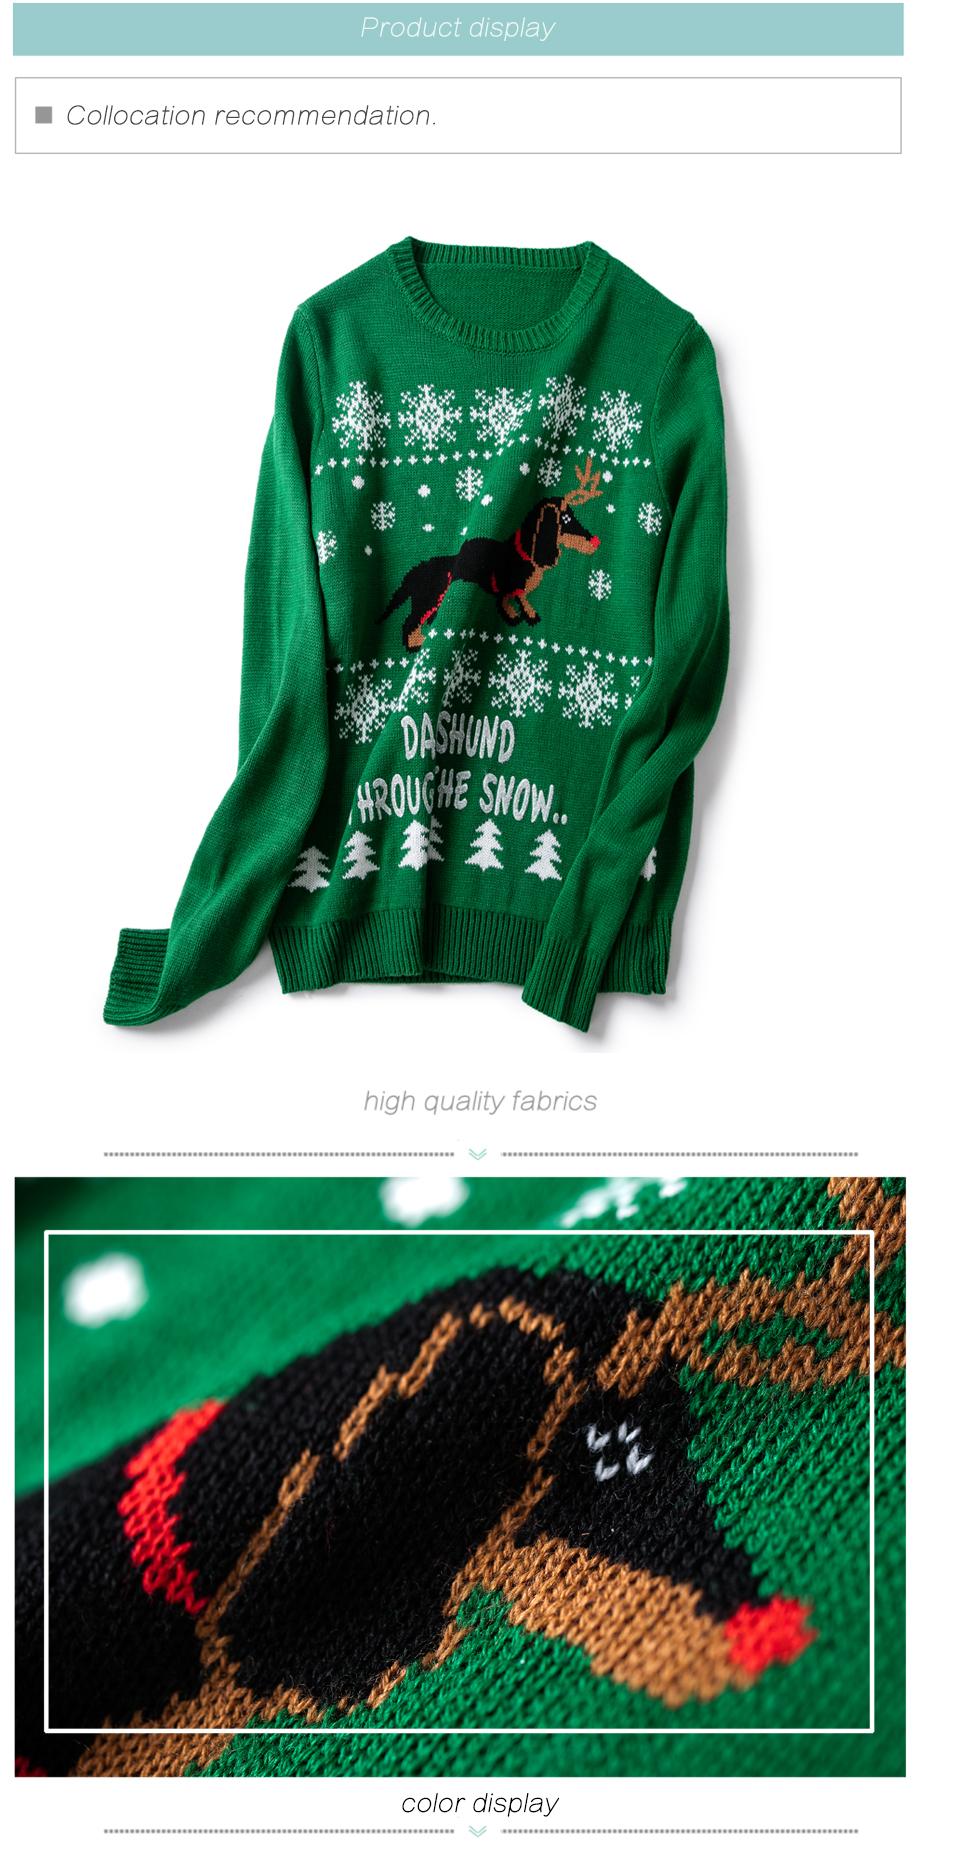 HTB1mLecnjuhSKJjSspaq6xFgFXa4 - Christmas Sweater Cute Dachshund Embroidery Snow Letter Women Pullovers Long Sleeve Knitting Outwear PTC 287